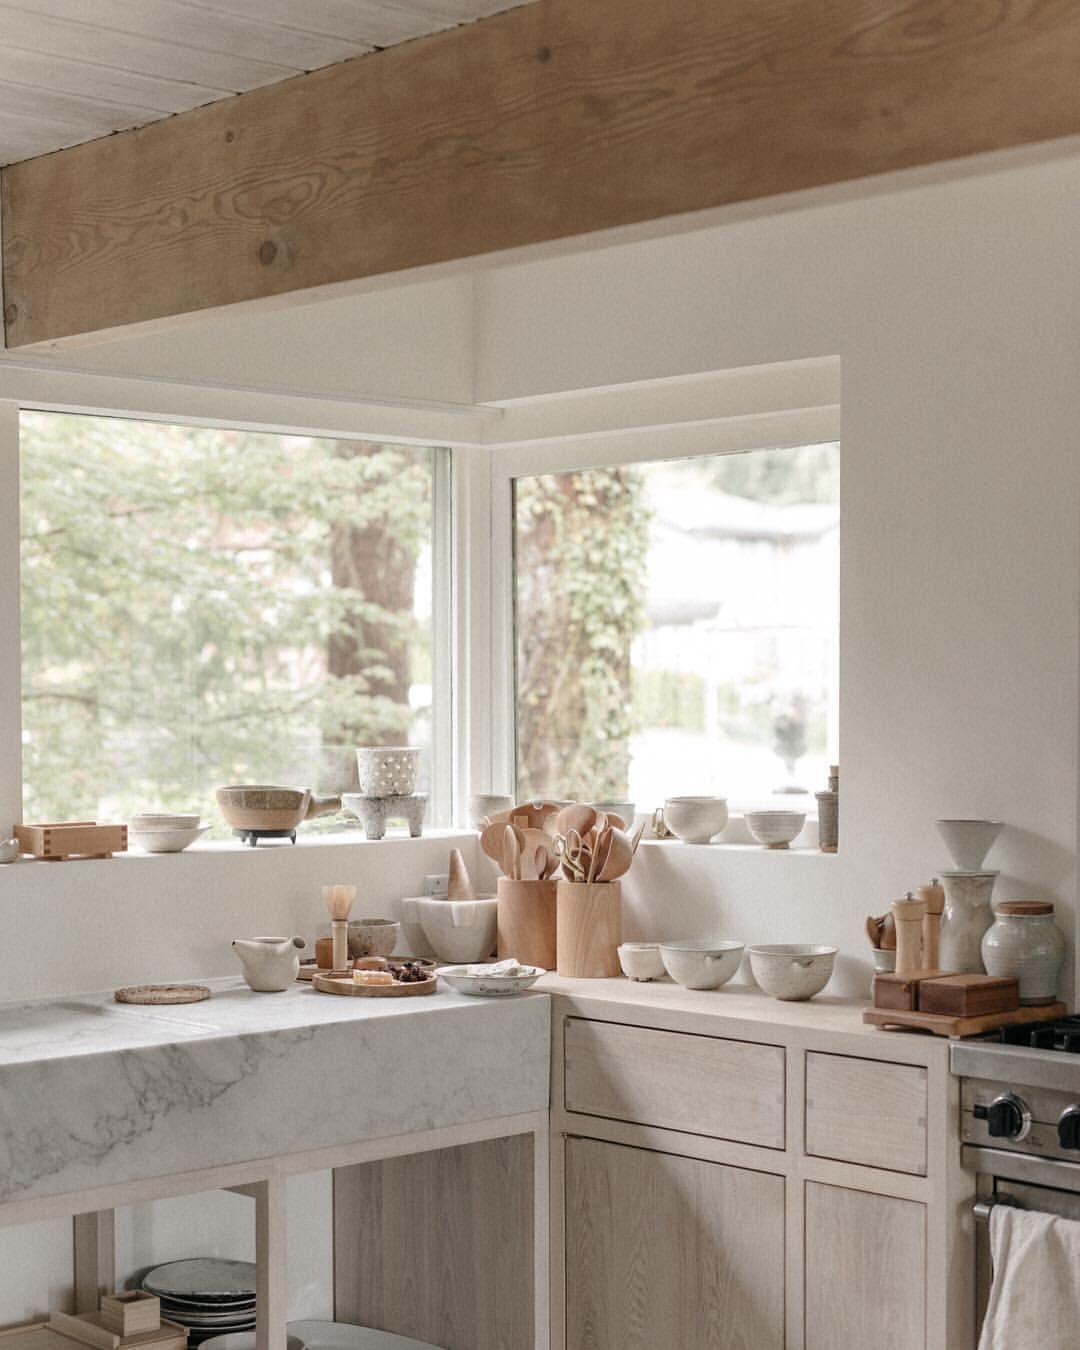 Tara mayerus vancouver kitchen photo by gillianstevens modern